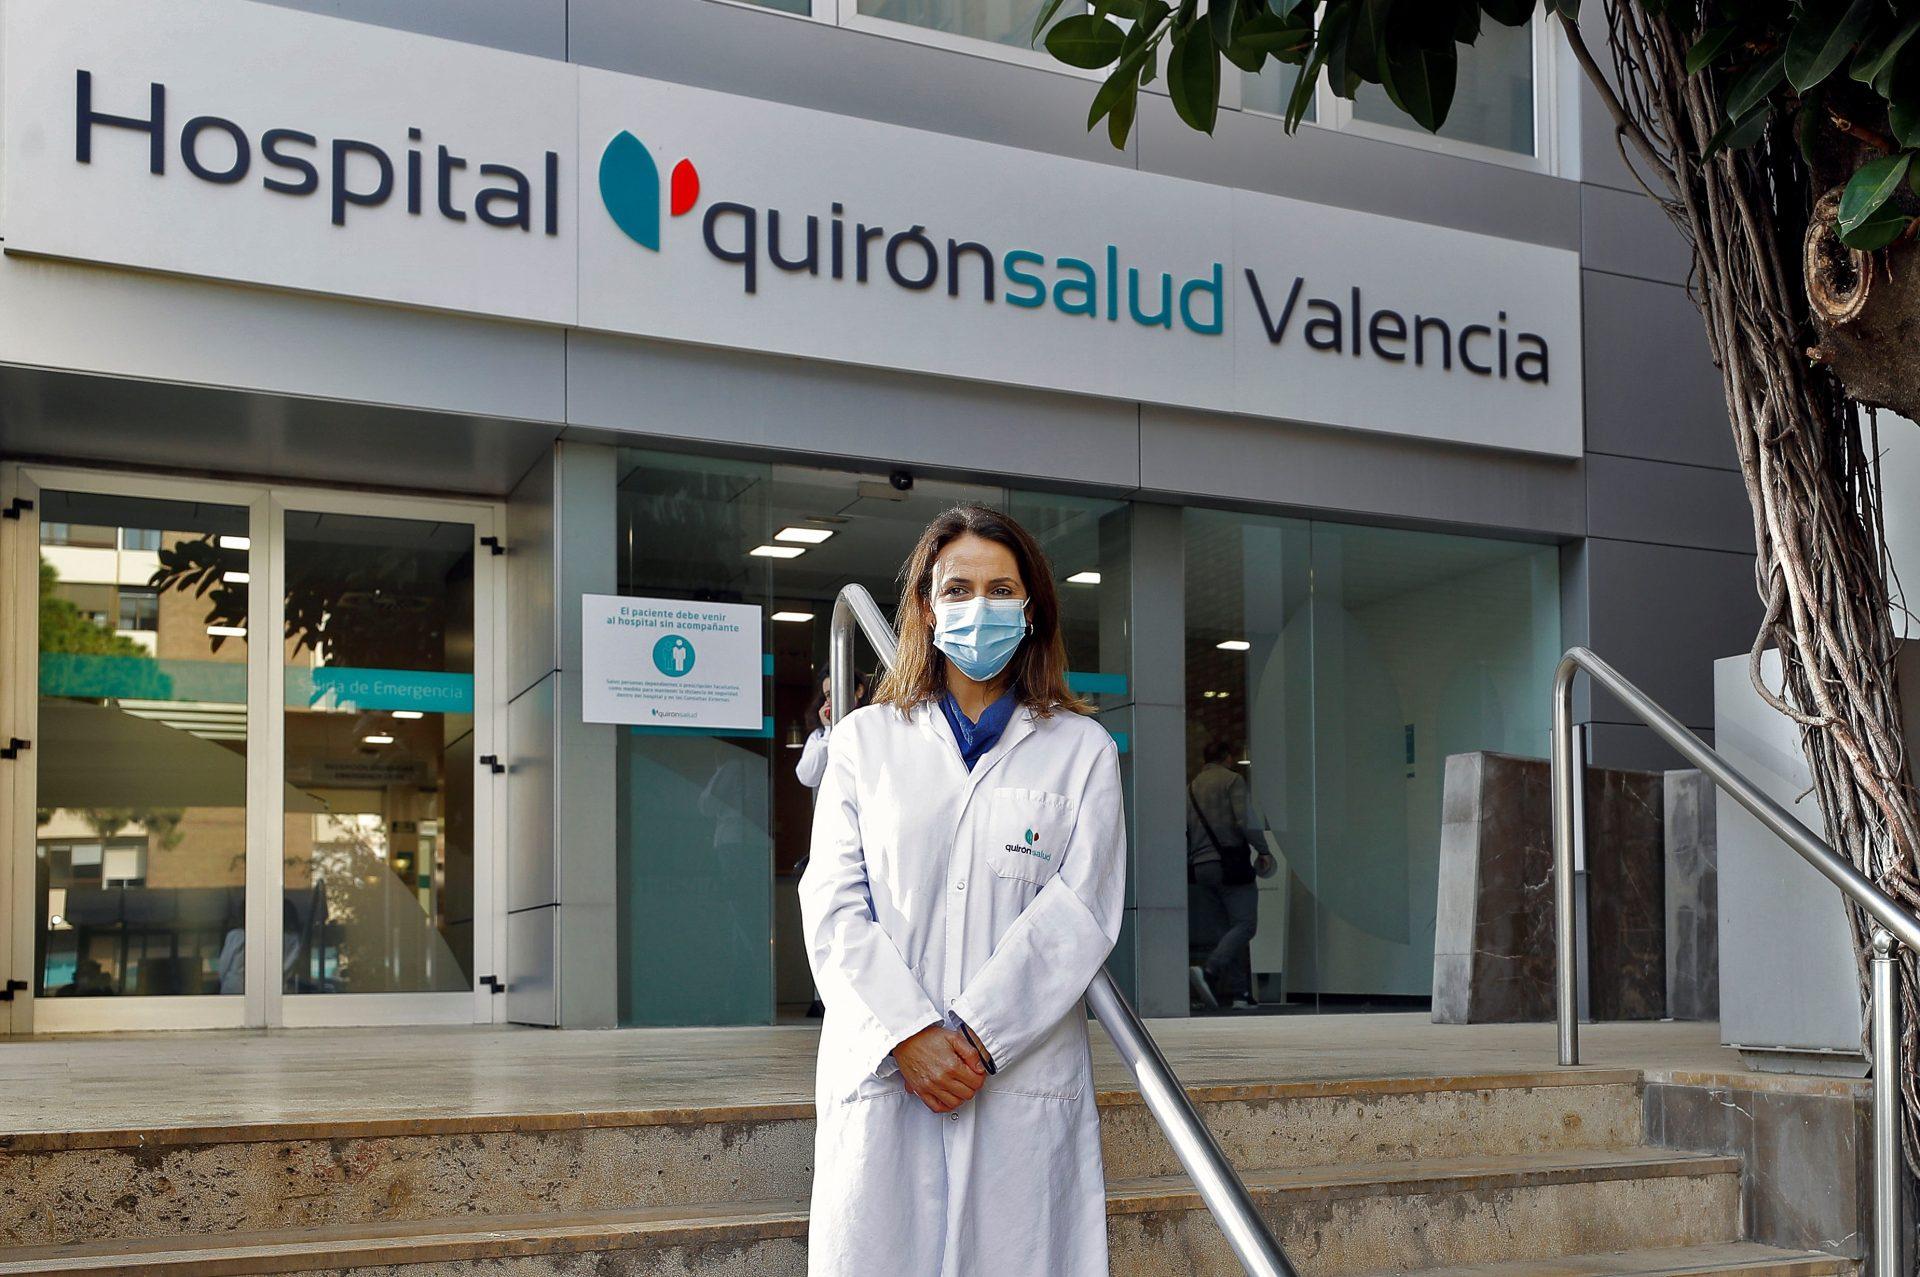 La doctora Ruth Usó, directora médica de Quironsalud en València. EFE/Manu Bruque